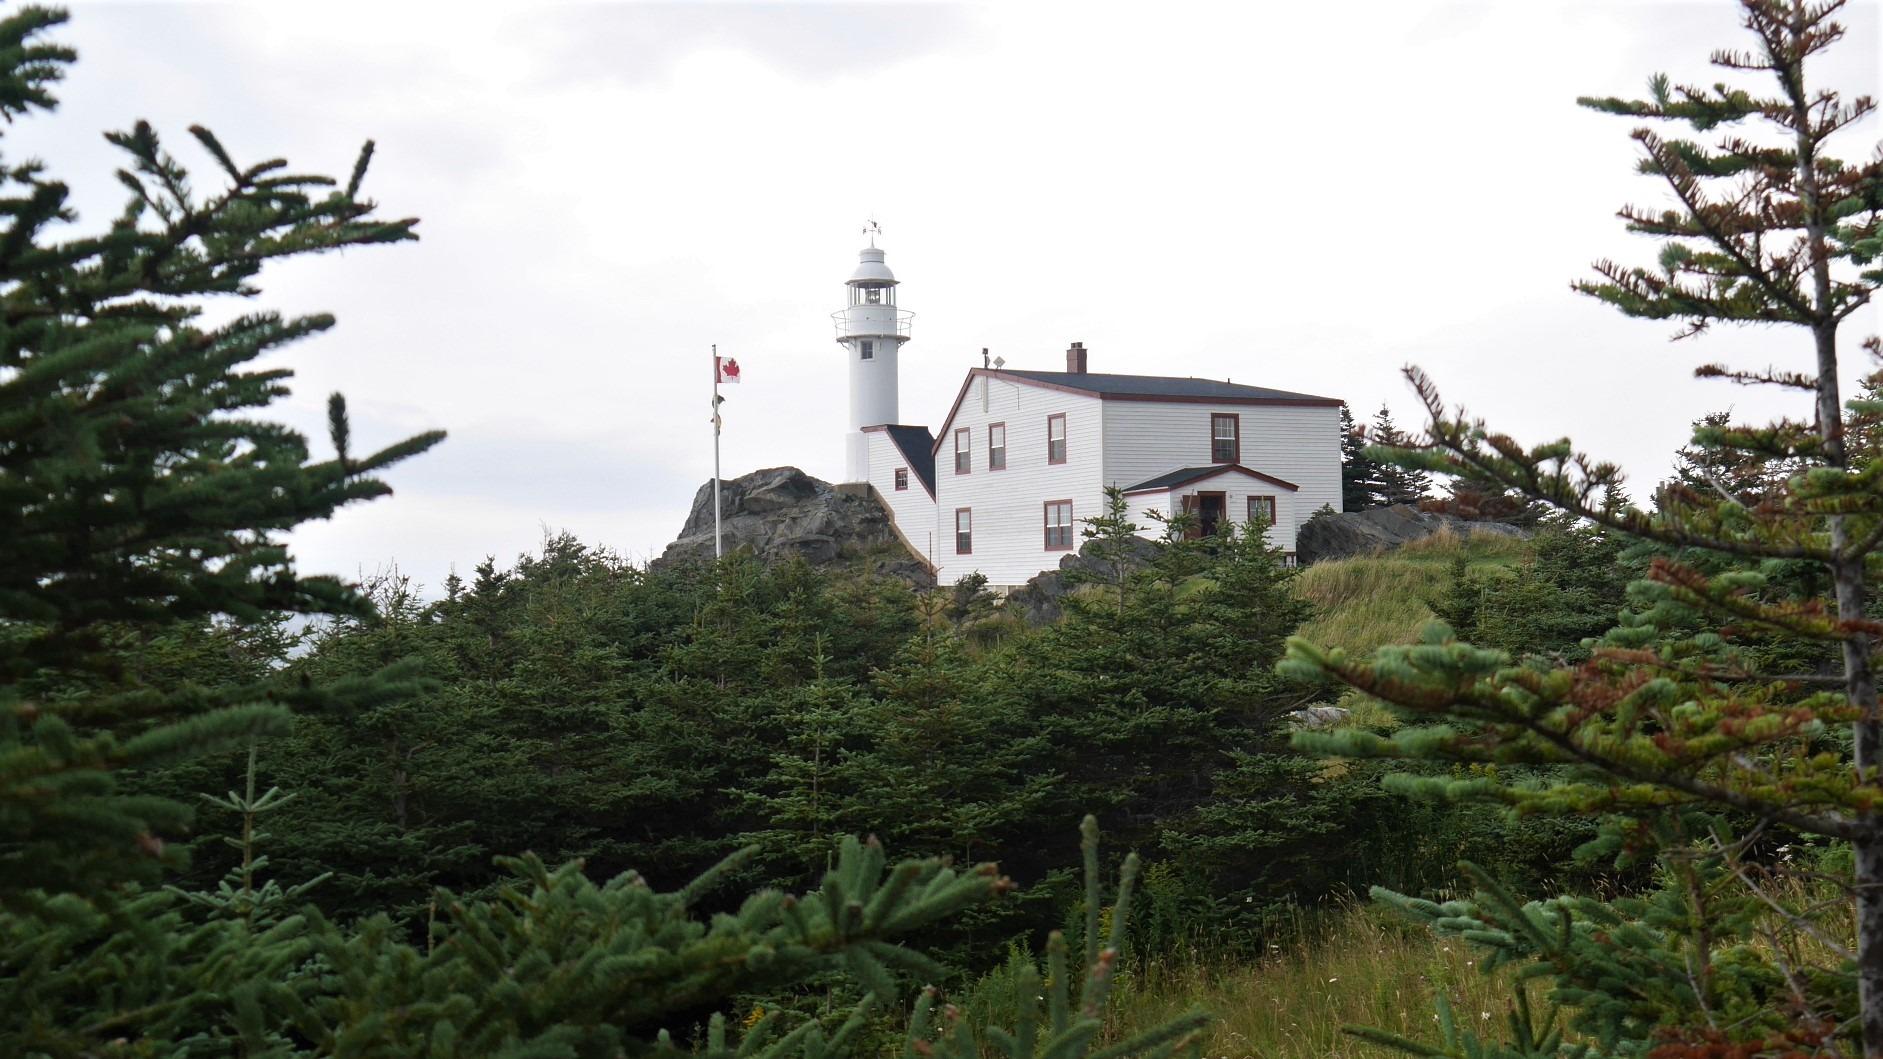 Terre-Neuve parc national Gros-Morne phare Lobster Cove Head